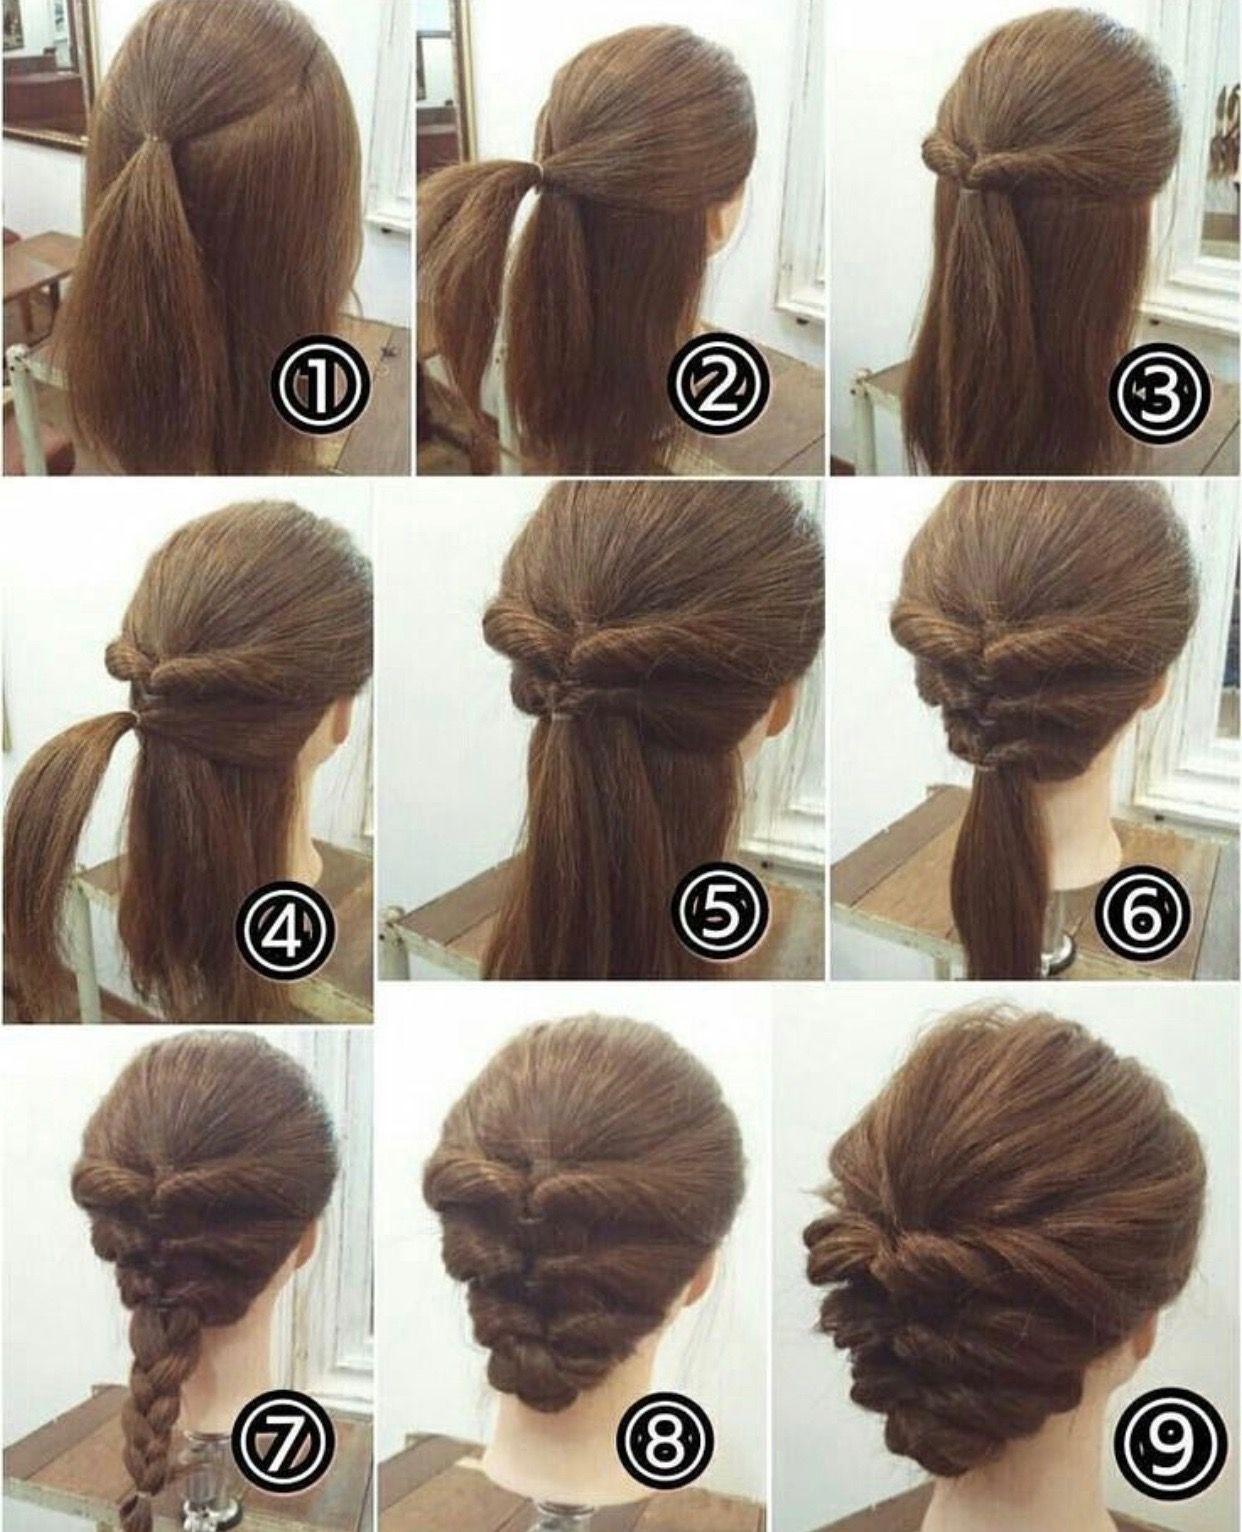 Pin By Nehulicious On Hair Games Long Hair Styles Short